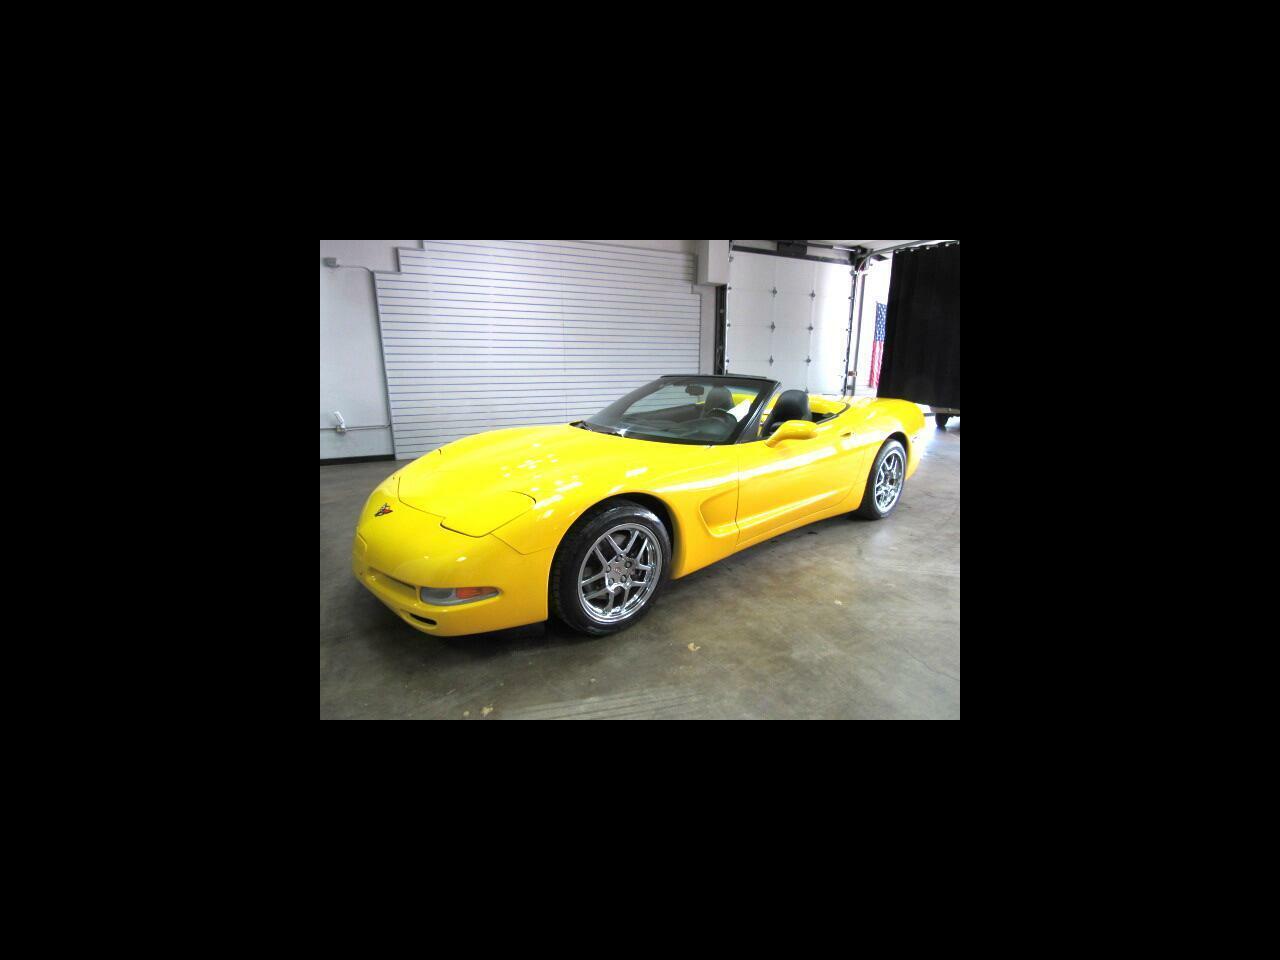 2000 Yellow Chevrolet Corvette Convertible  | C5 Corvette Photo 1